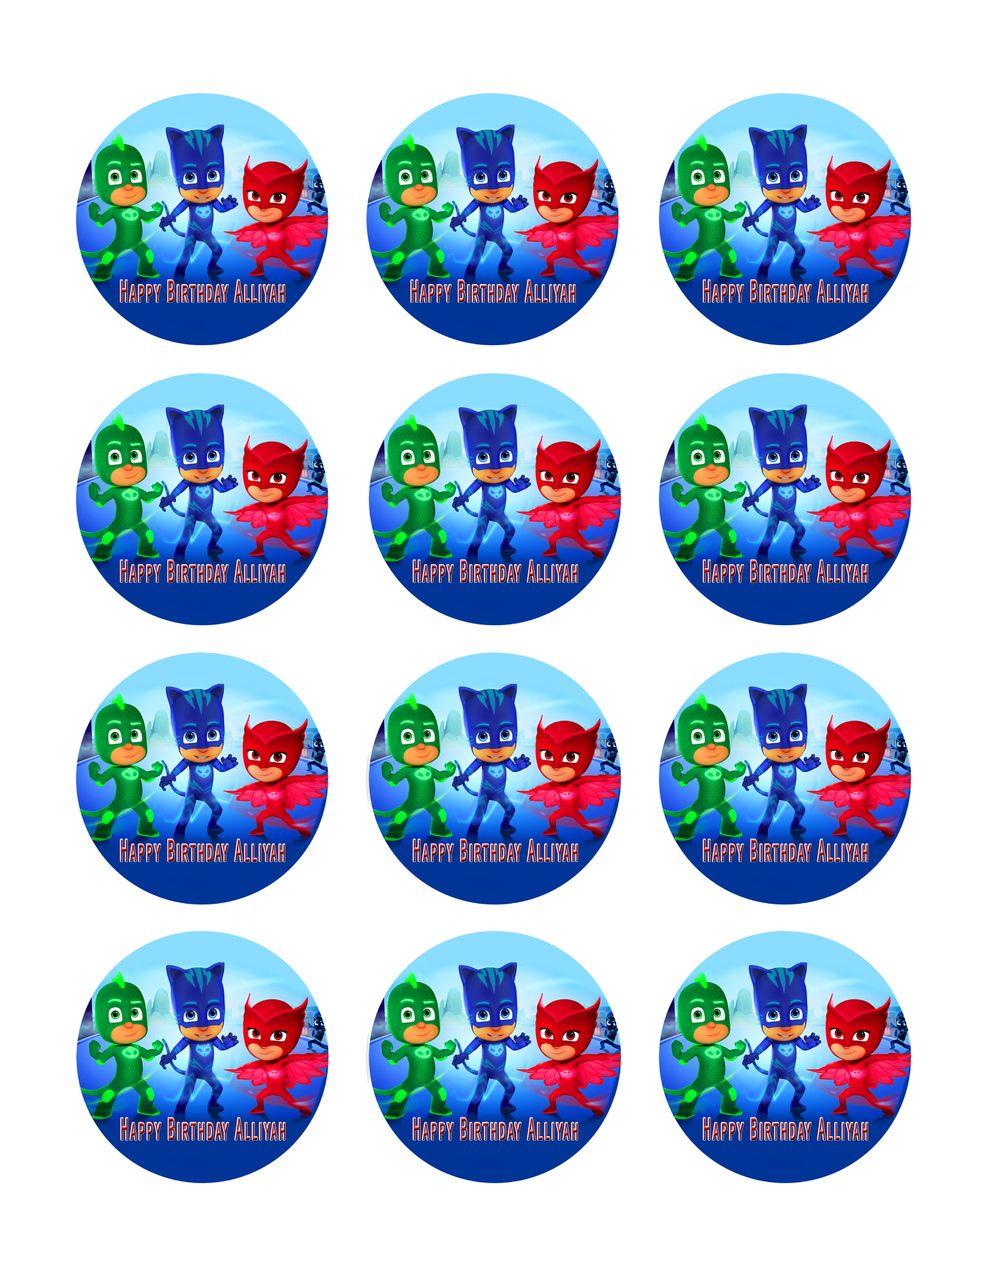 PJ MASKS (1) - Edible Cake Topper OR Cupcake Topper, Decor ...